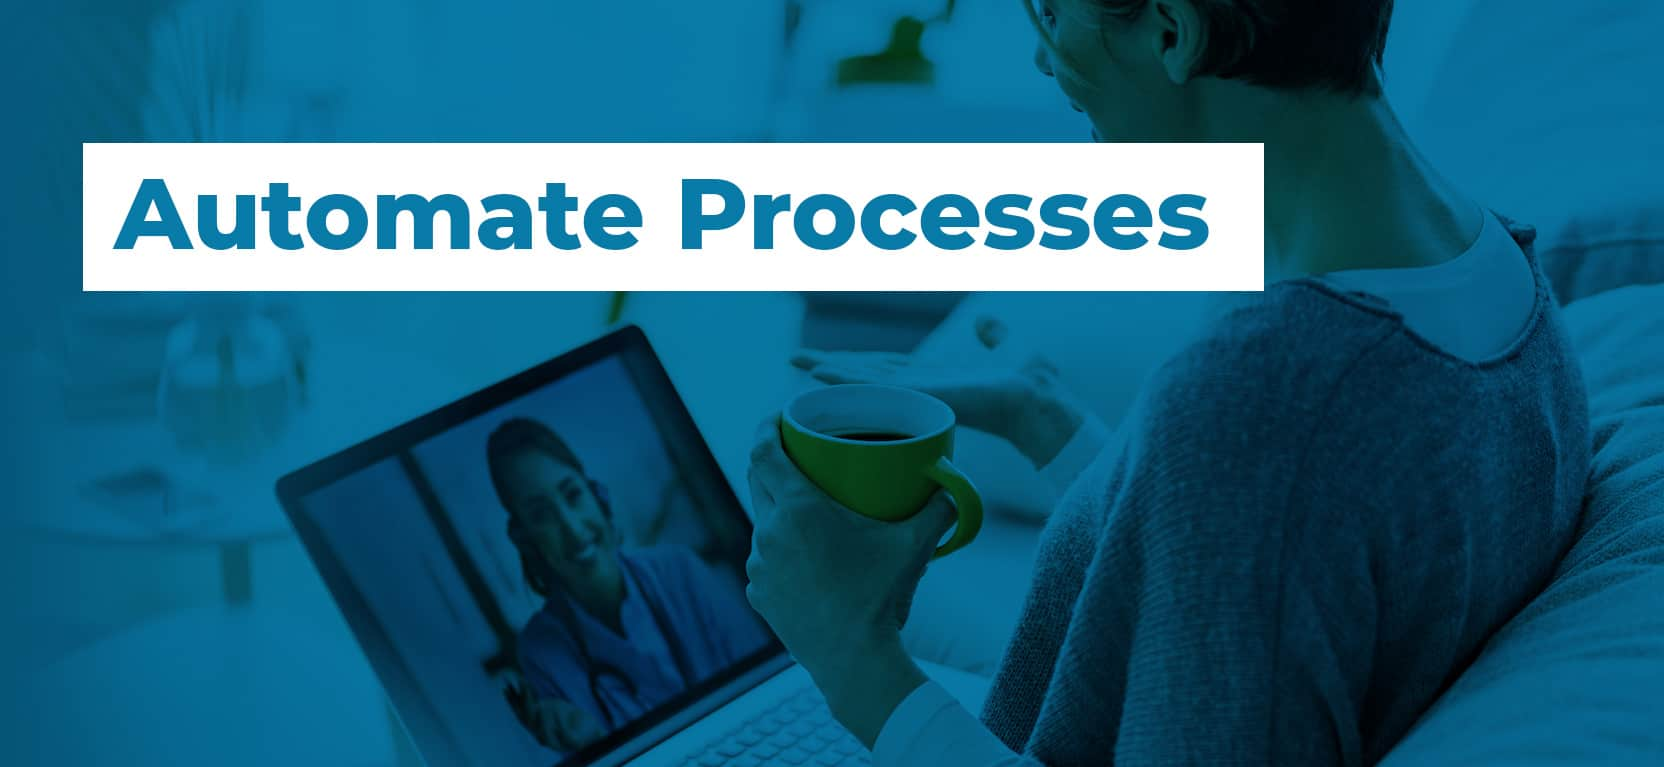 11 Automate Processes2